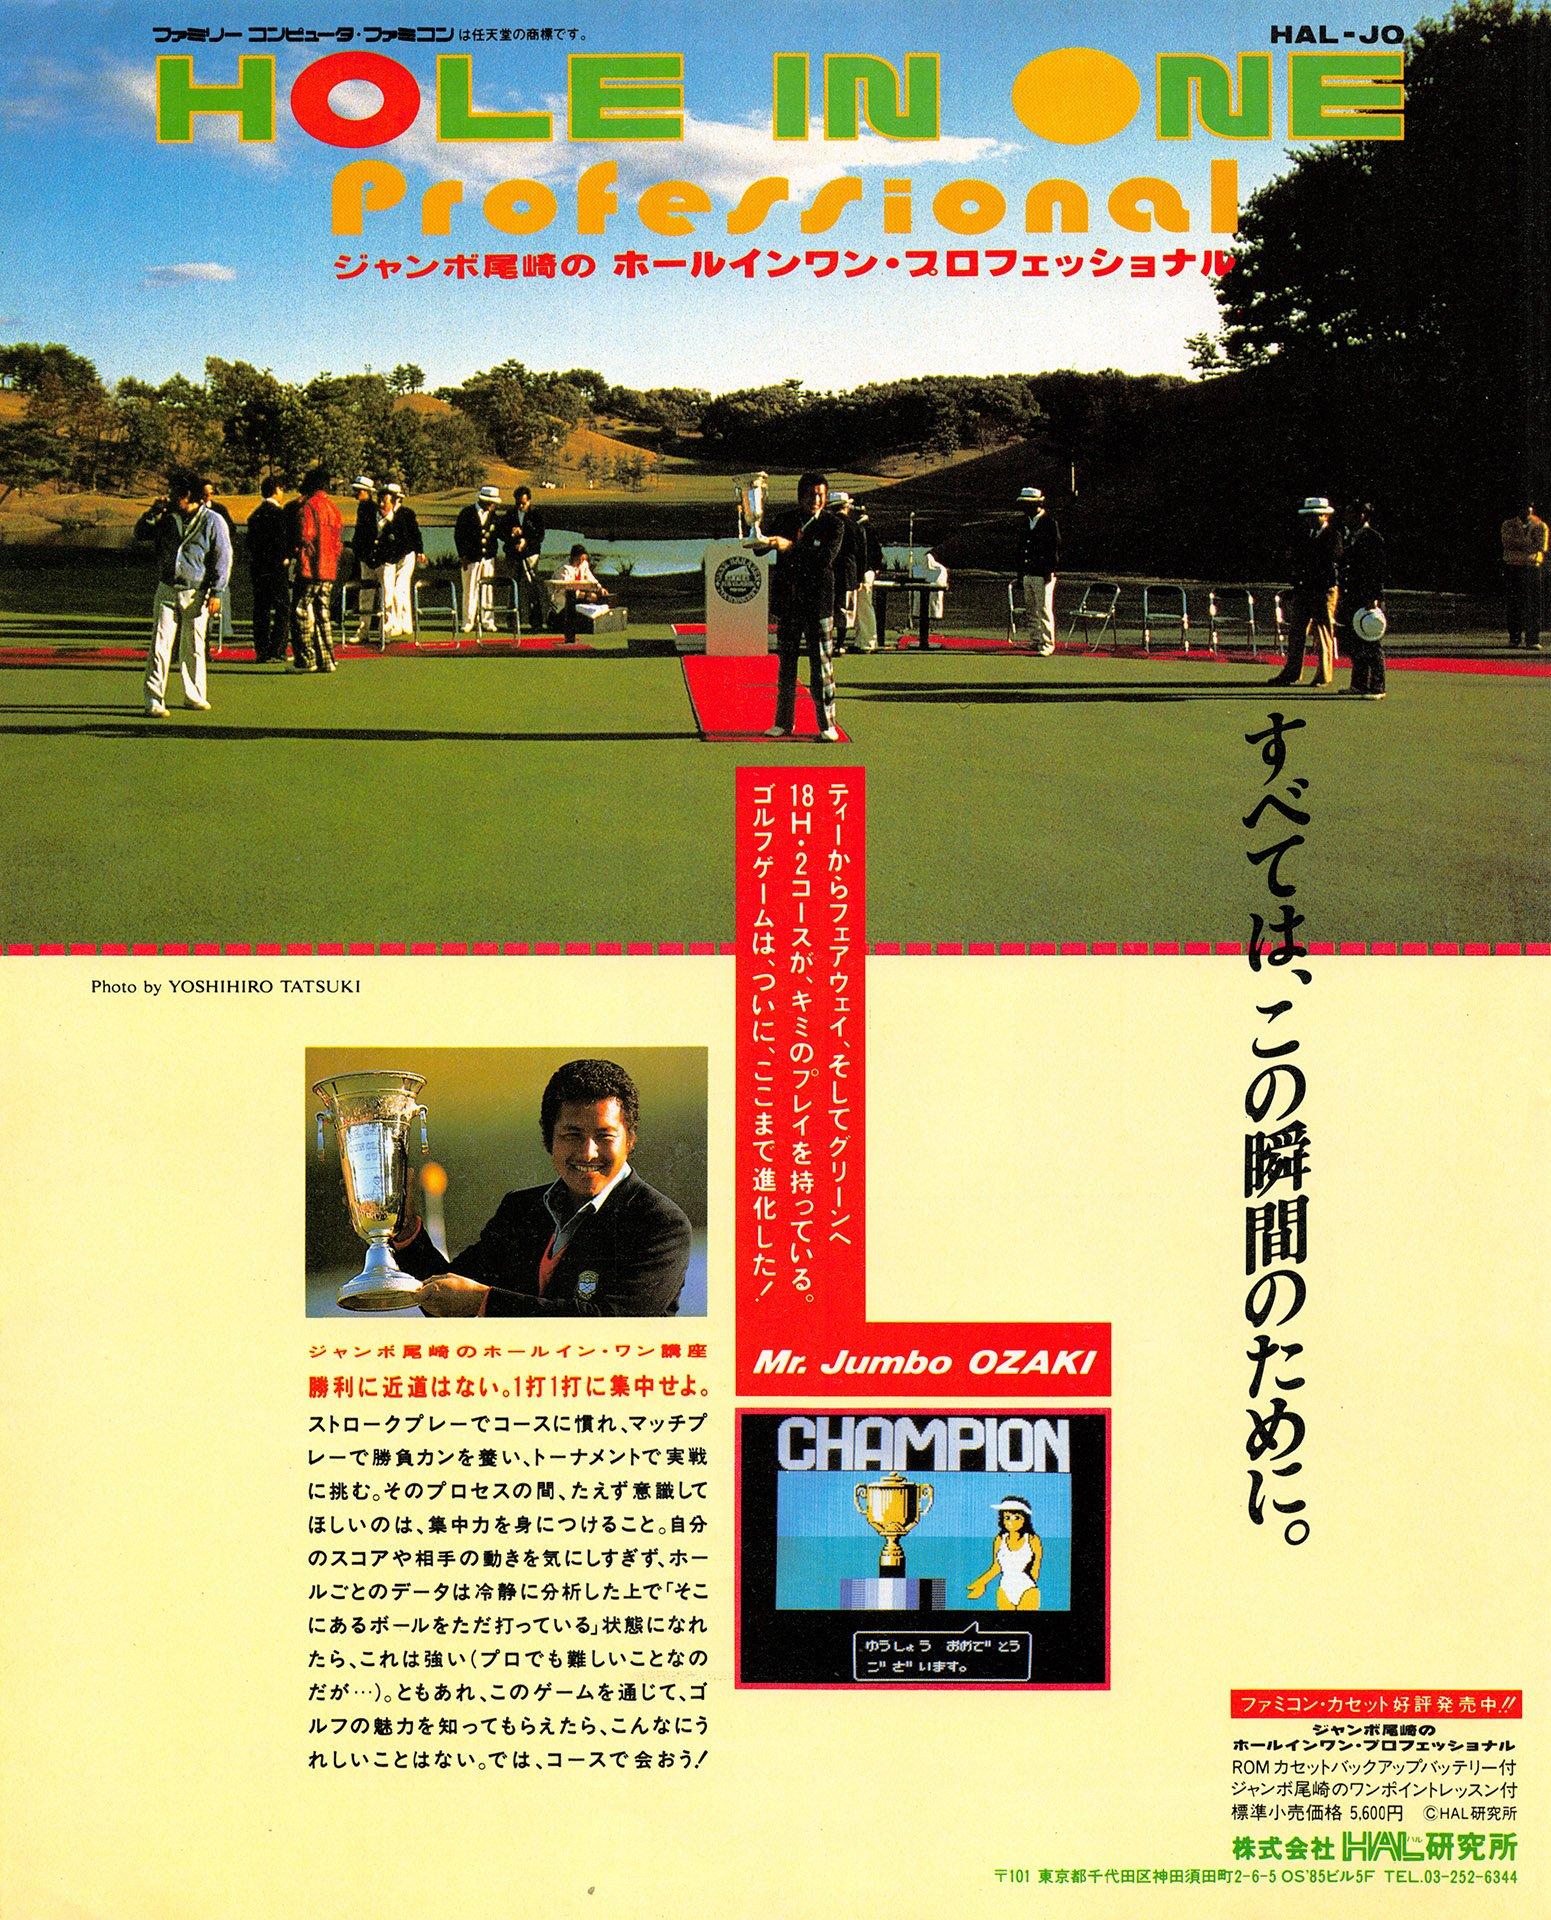 Jumbo Ozaki no Hole-in-One Professional (Japan) (2)